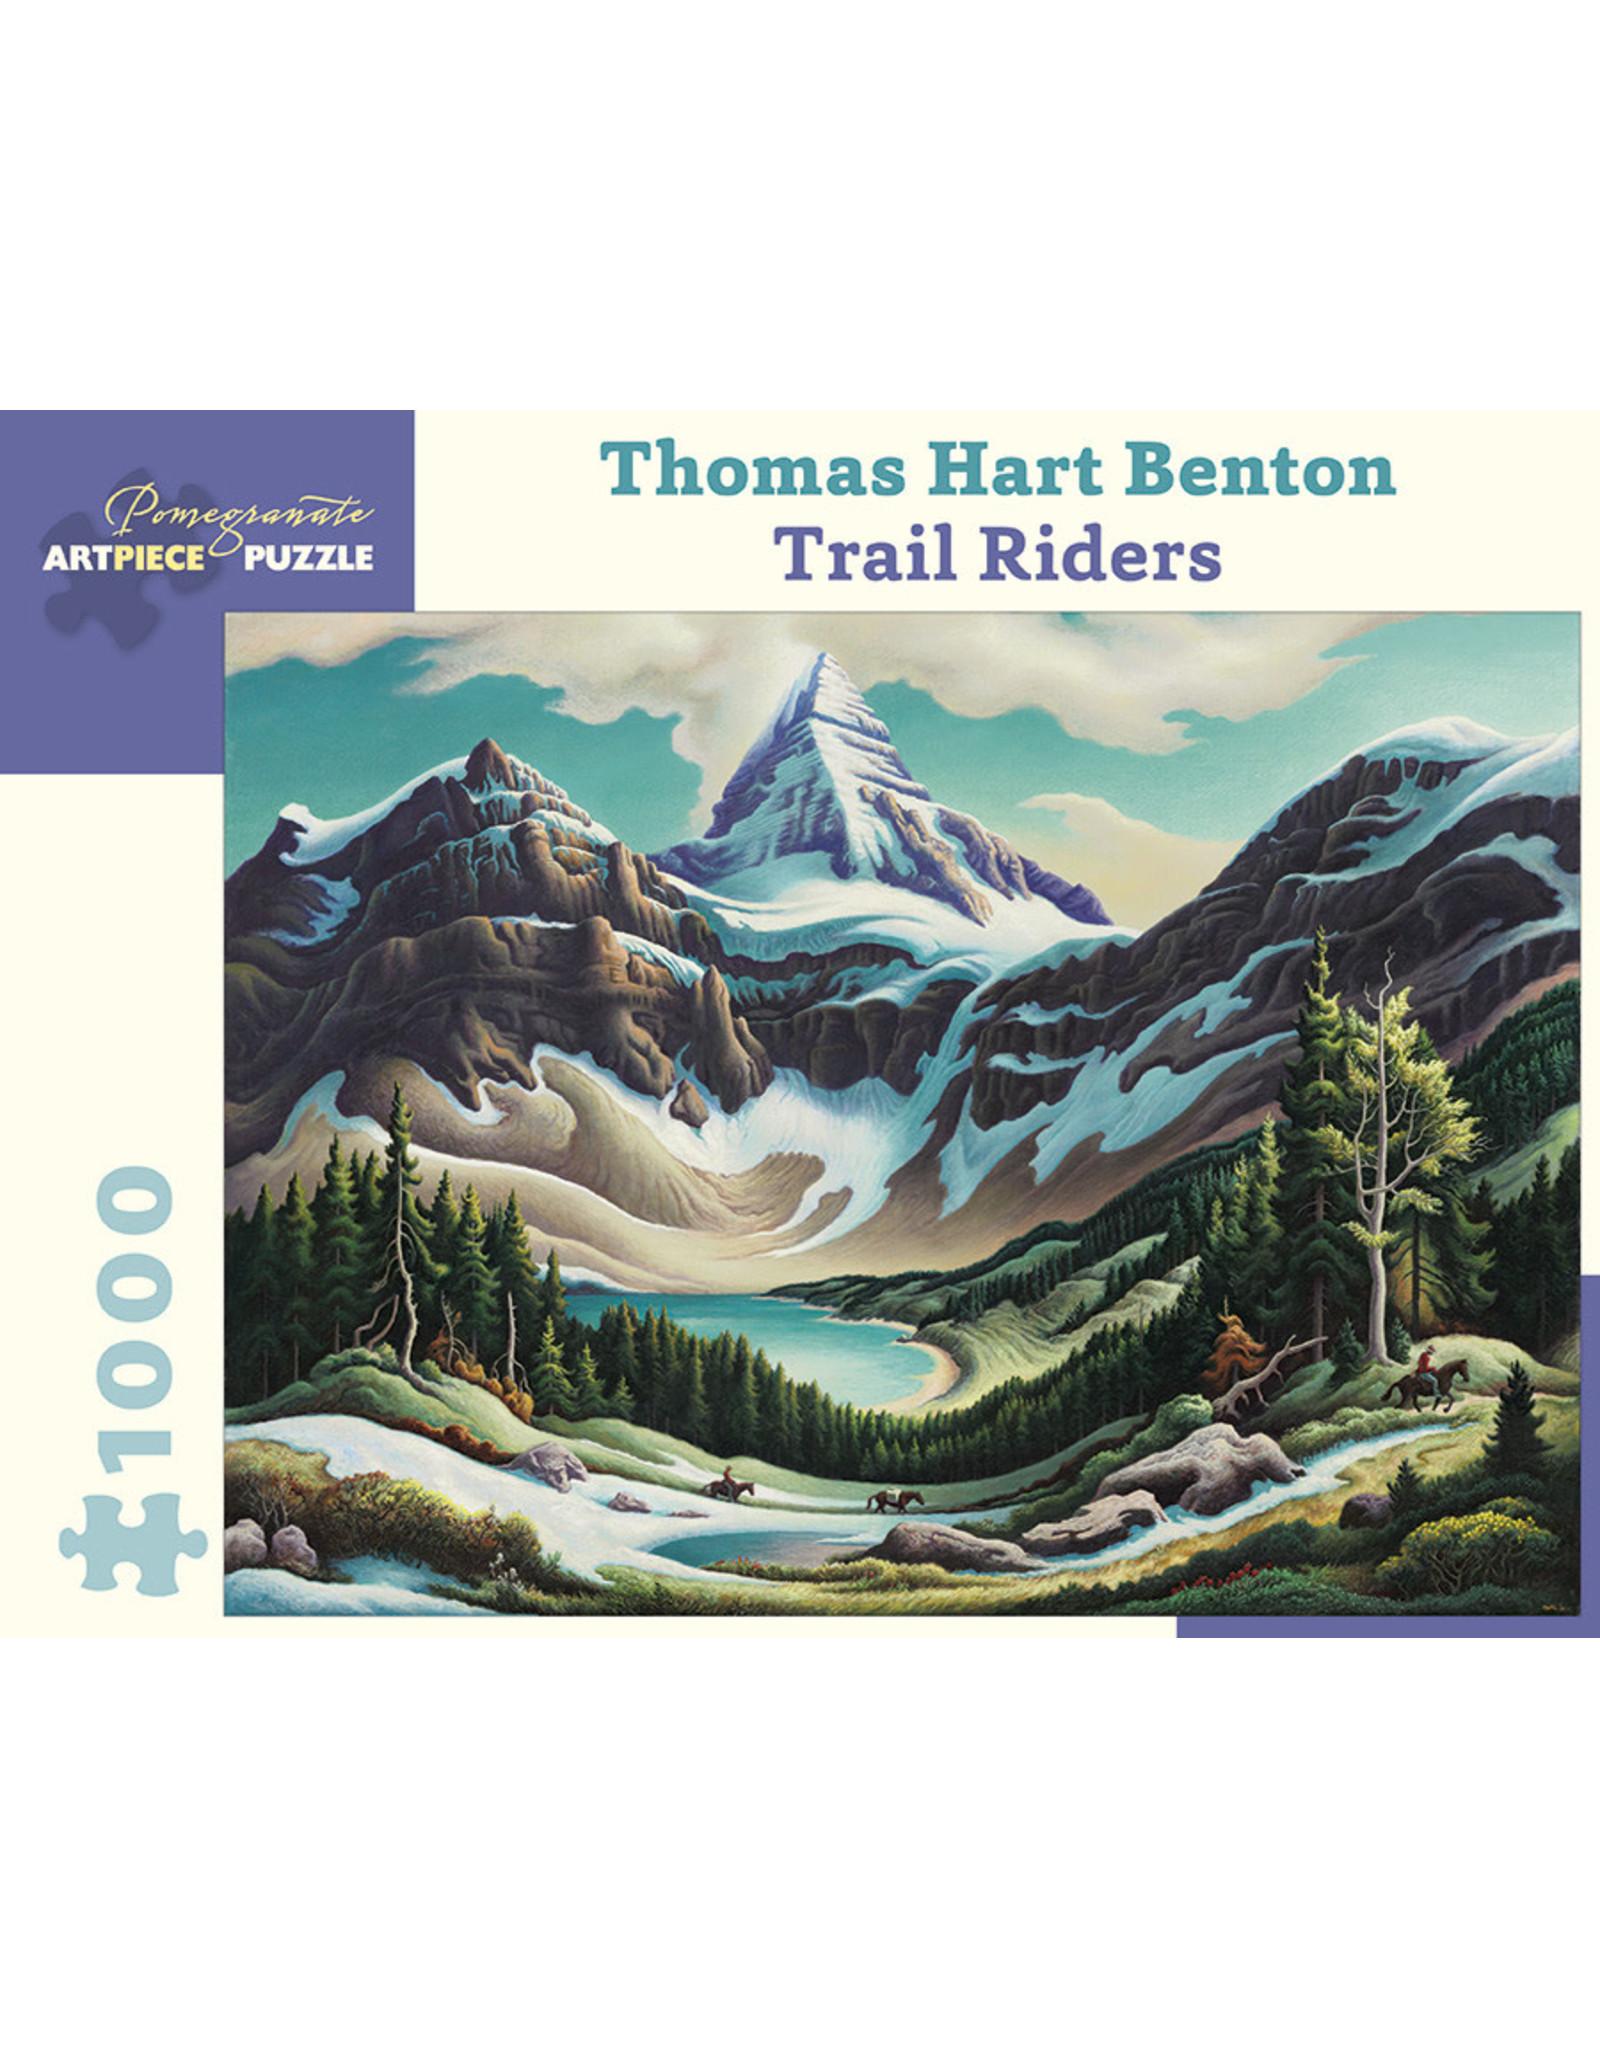 Pomegranate 1000 piece Trail Riders